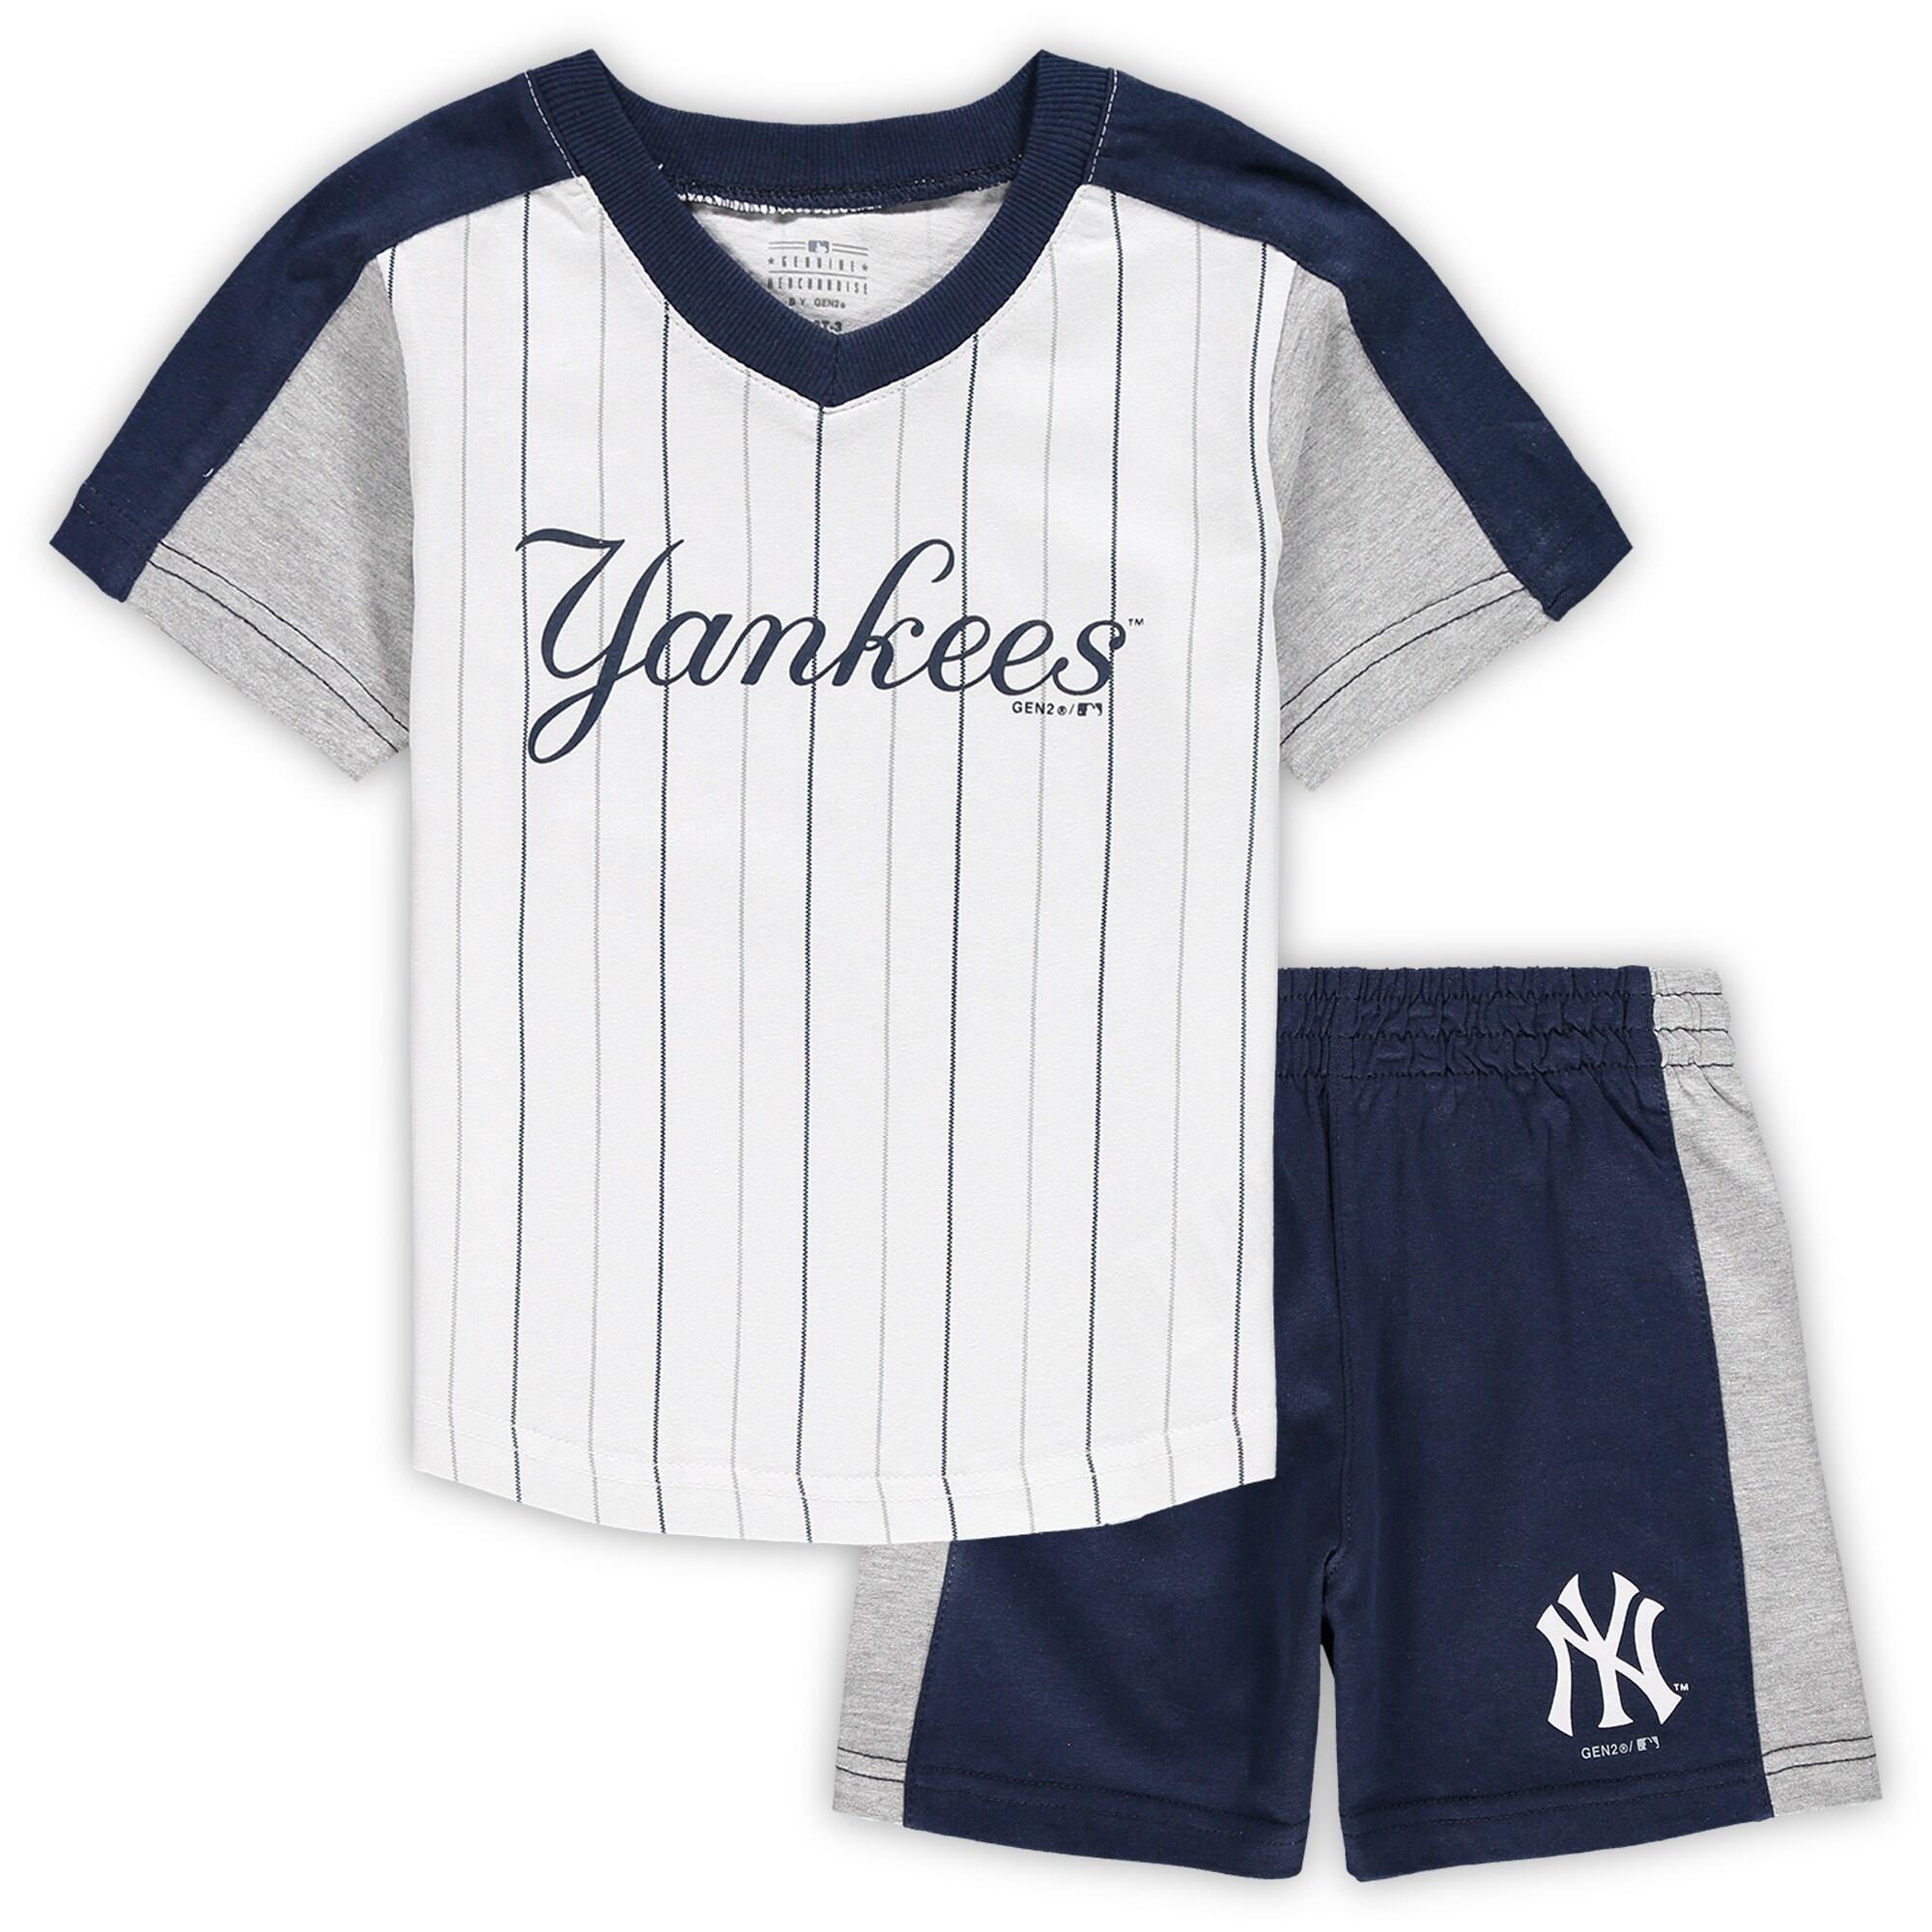 New York Yankees Toddler The Lineup V-Neck & Shorts Set - White/Navy